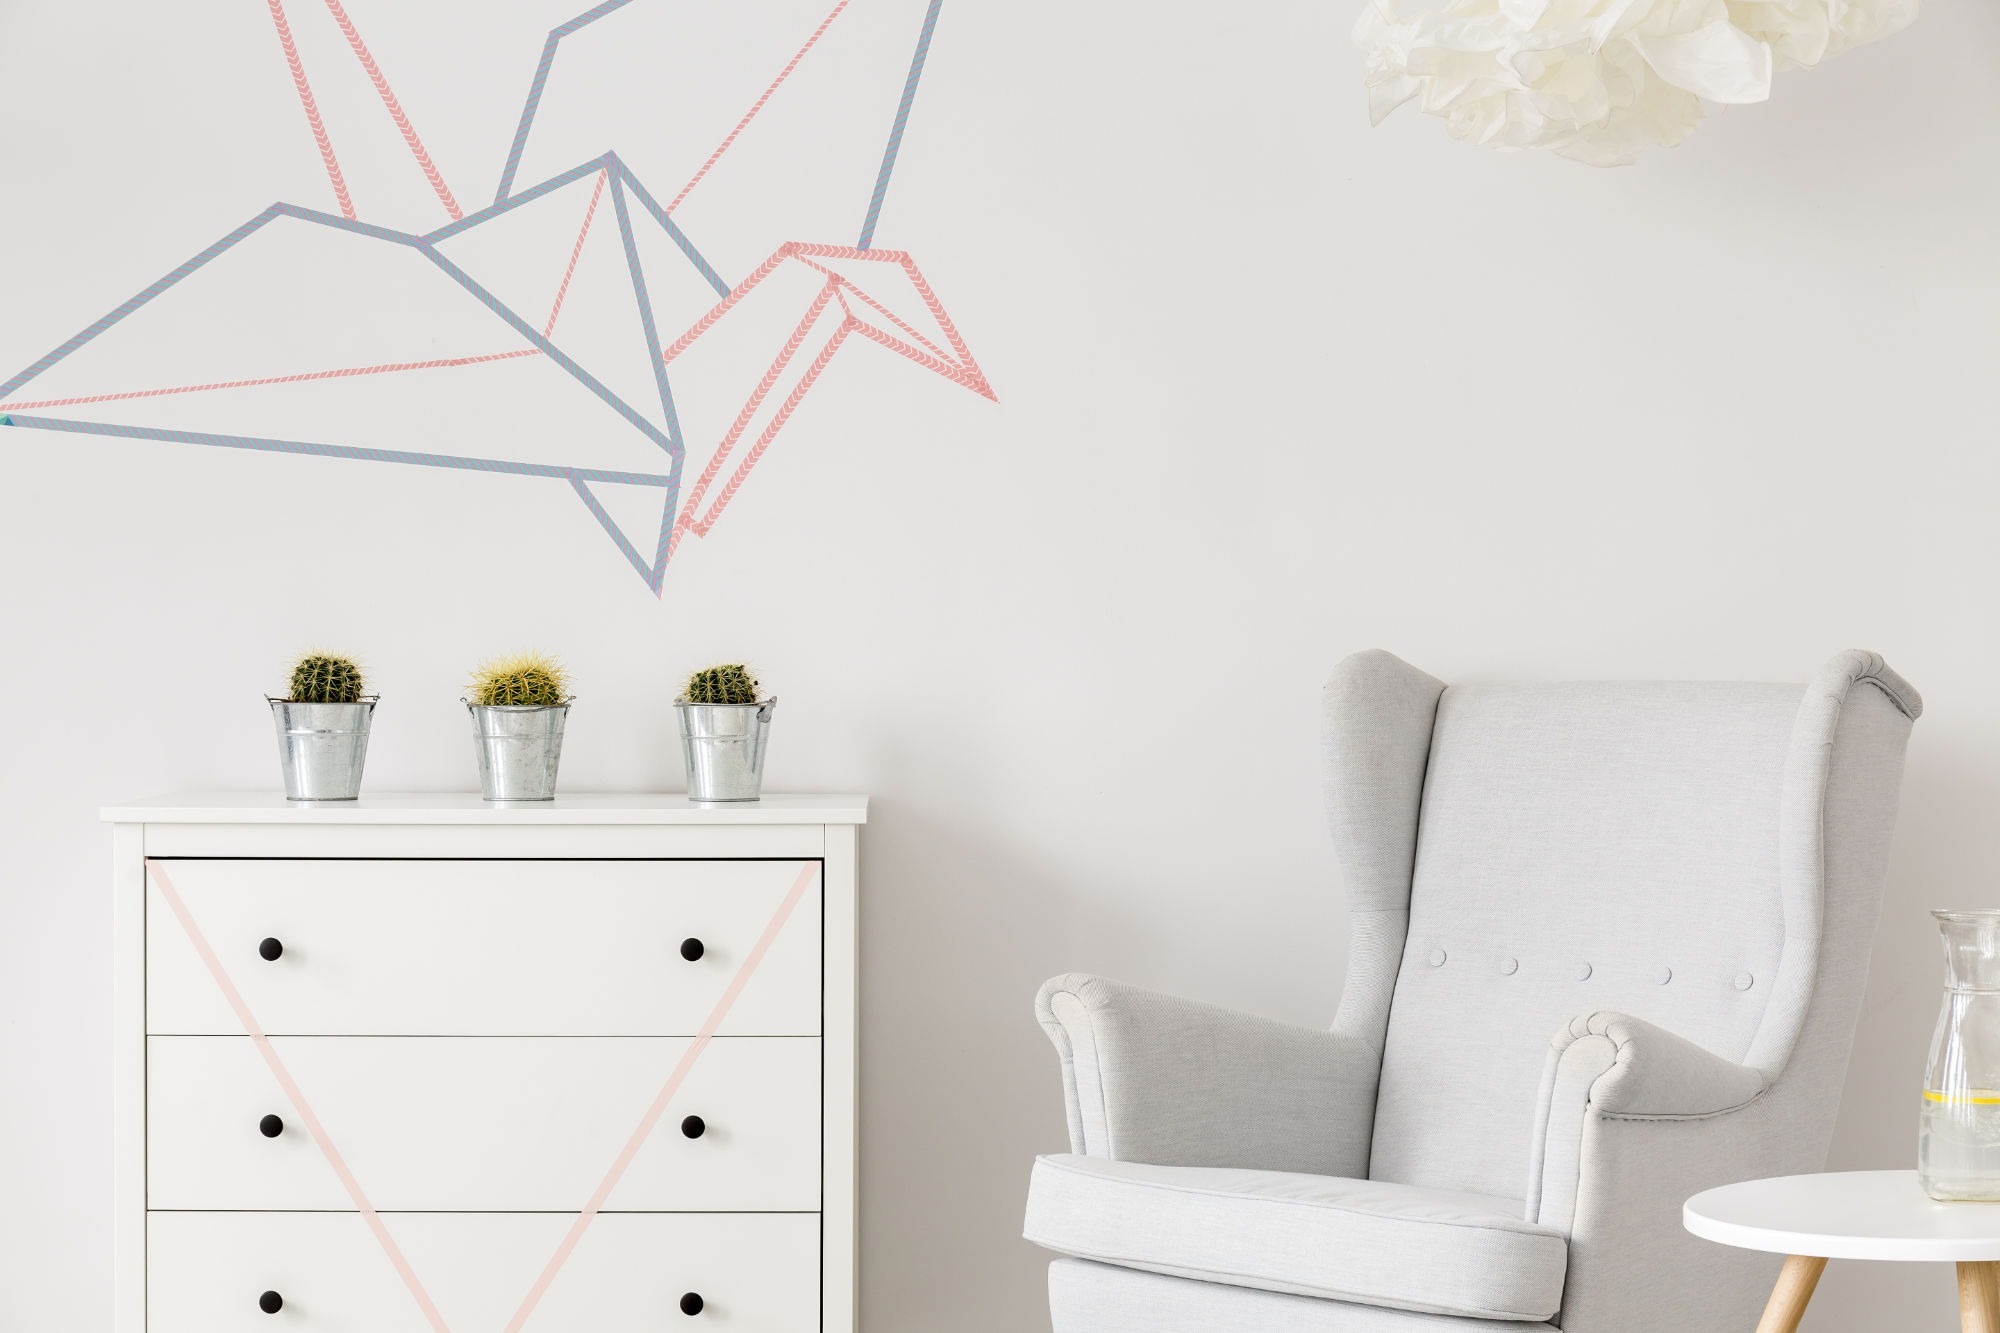 white-minimalist-interior-PSYFGGR.jpg